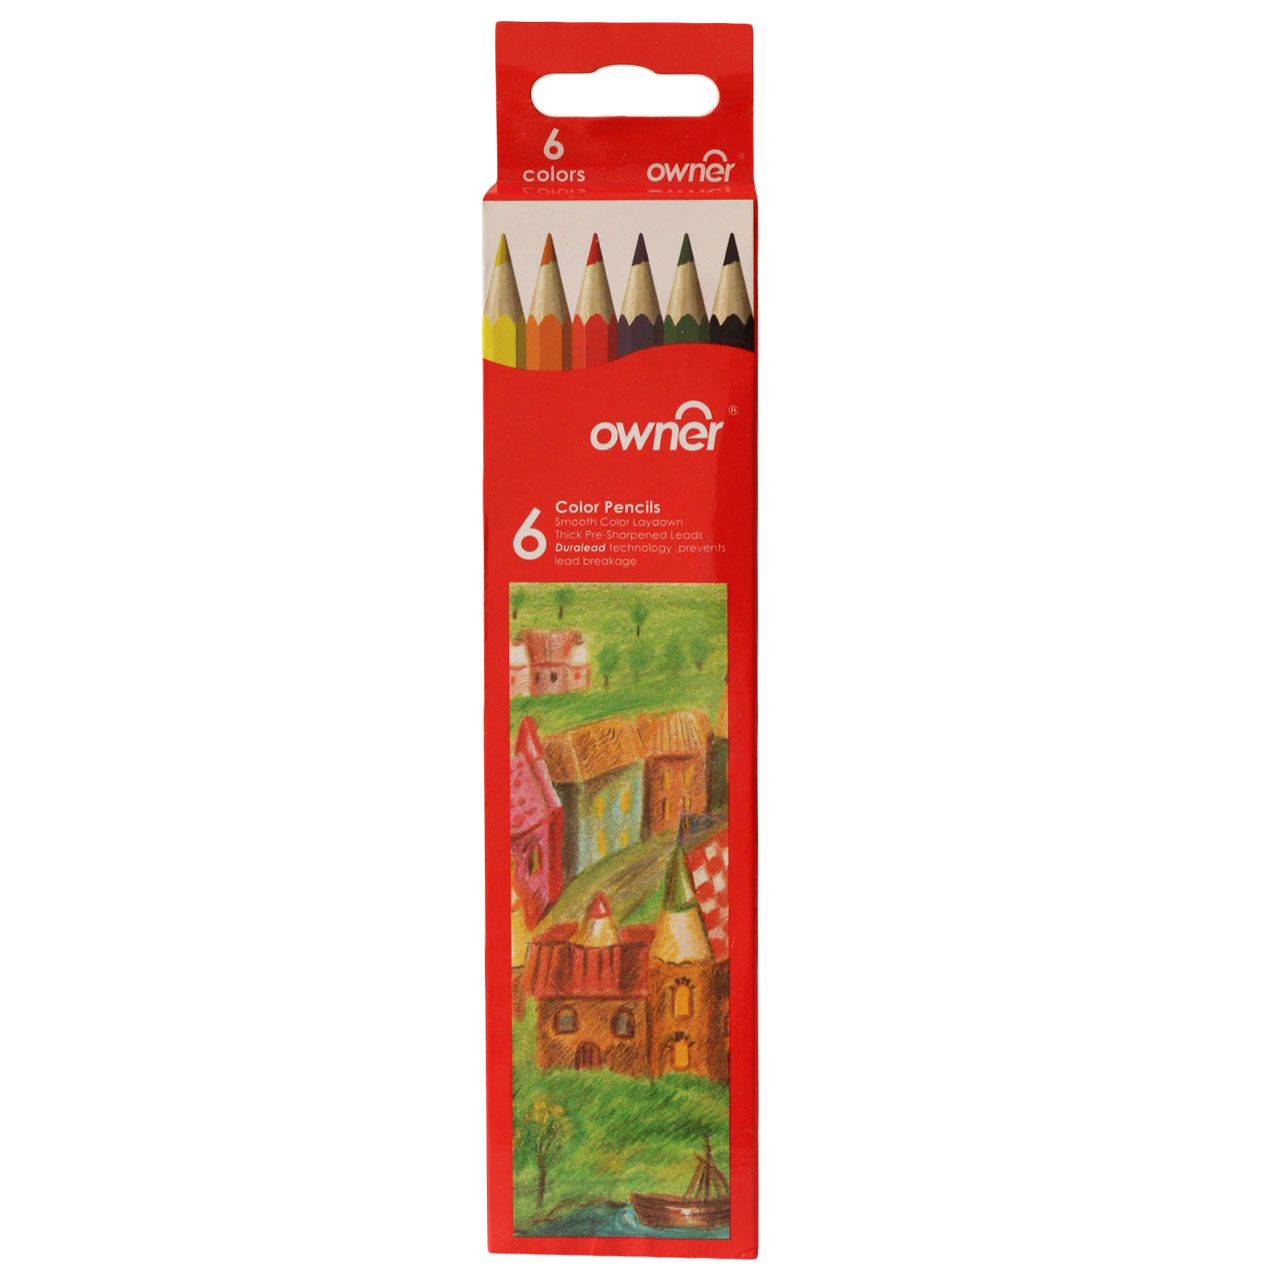 مداد رنگی 6 رنگ اونر مدل دورالید تکنولوژی